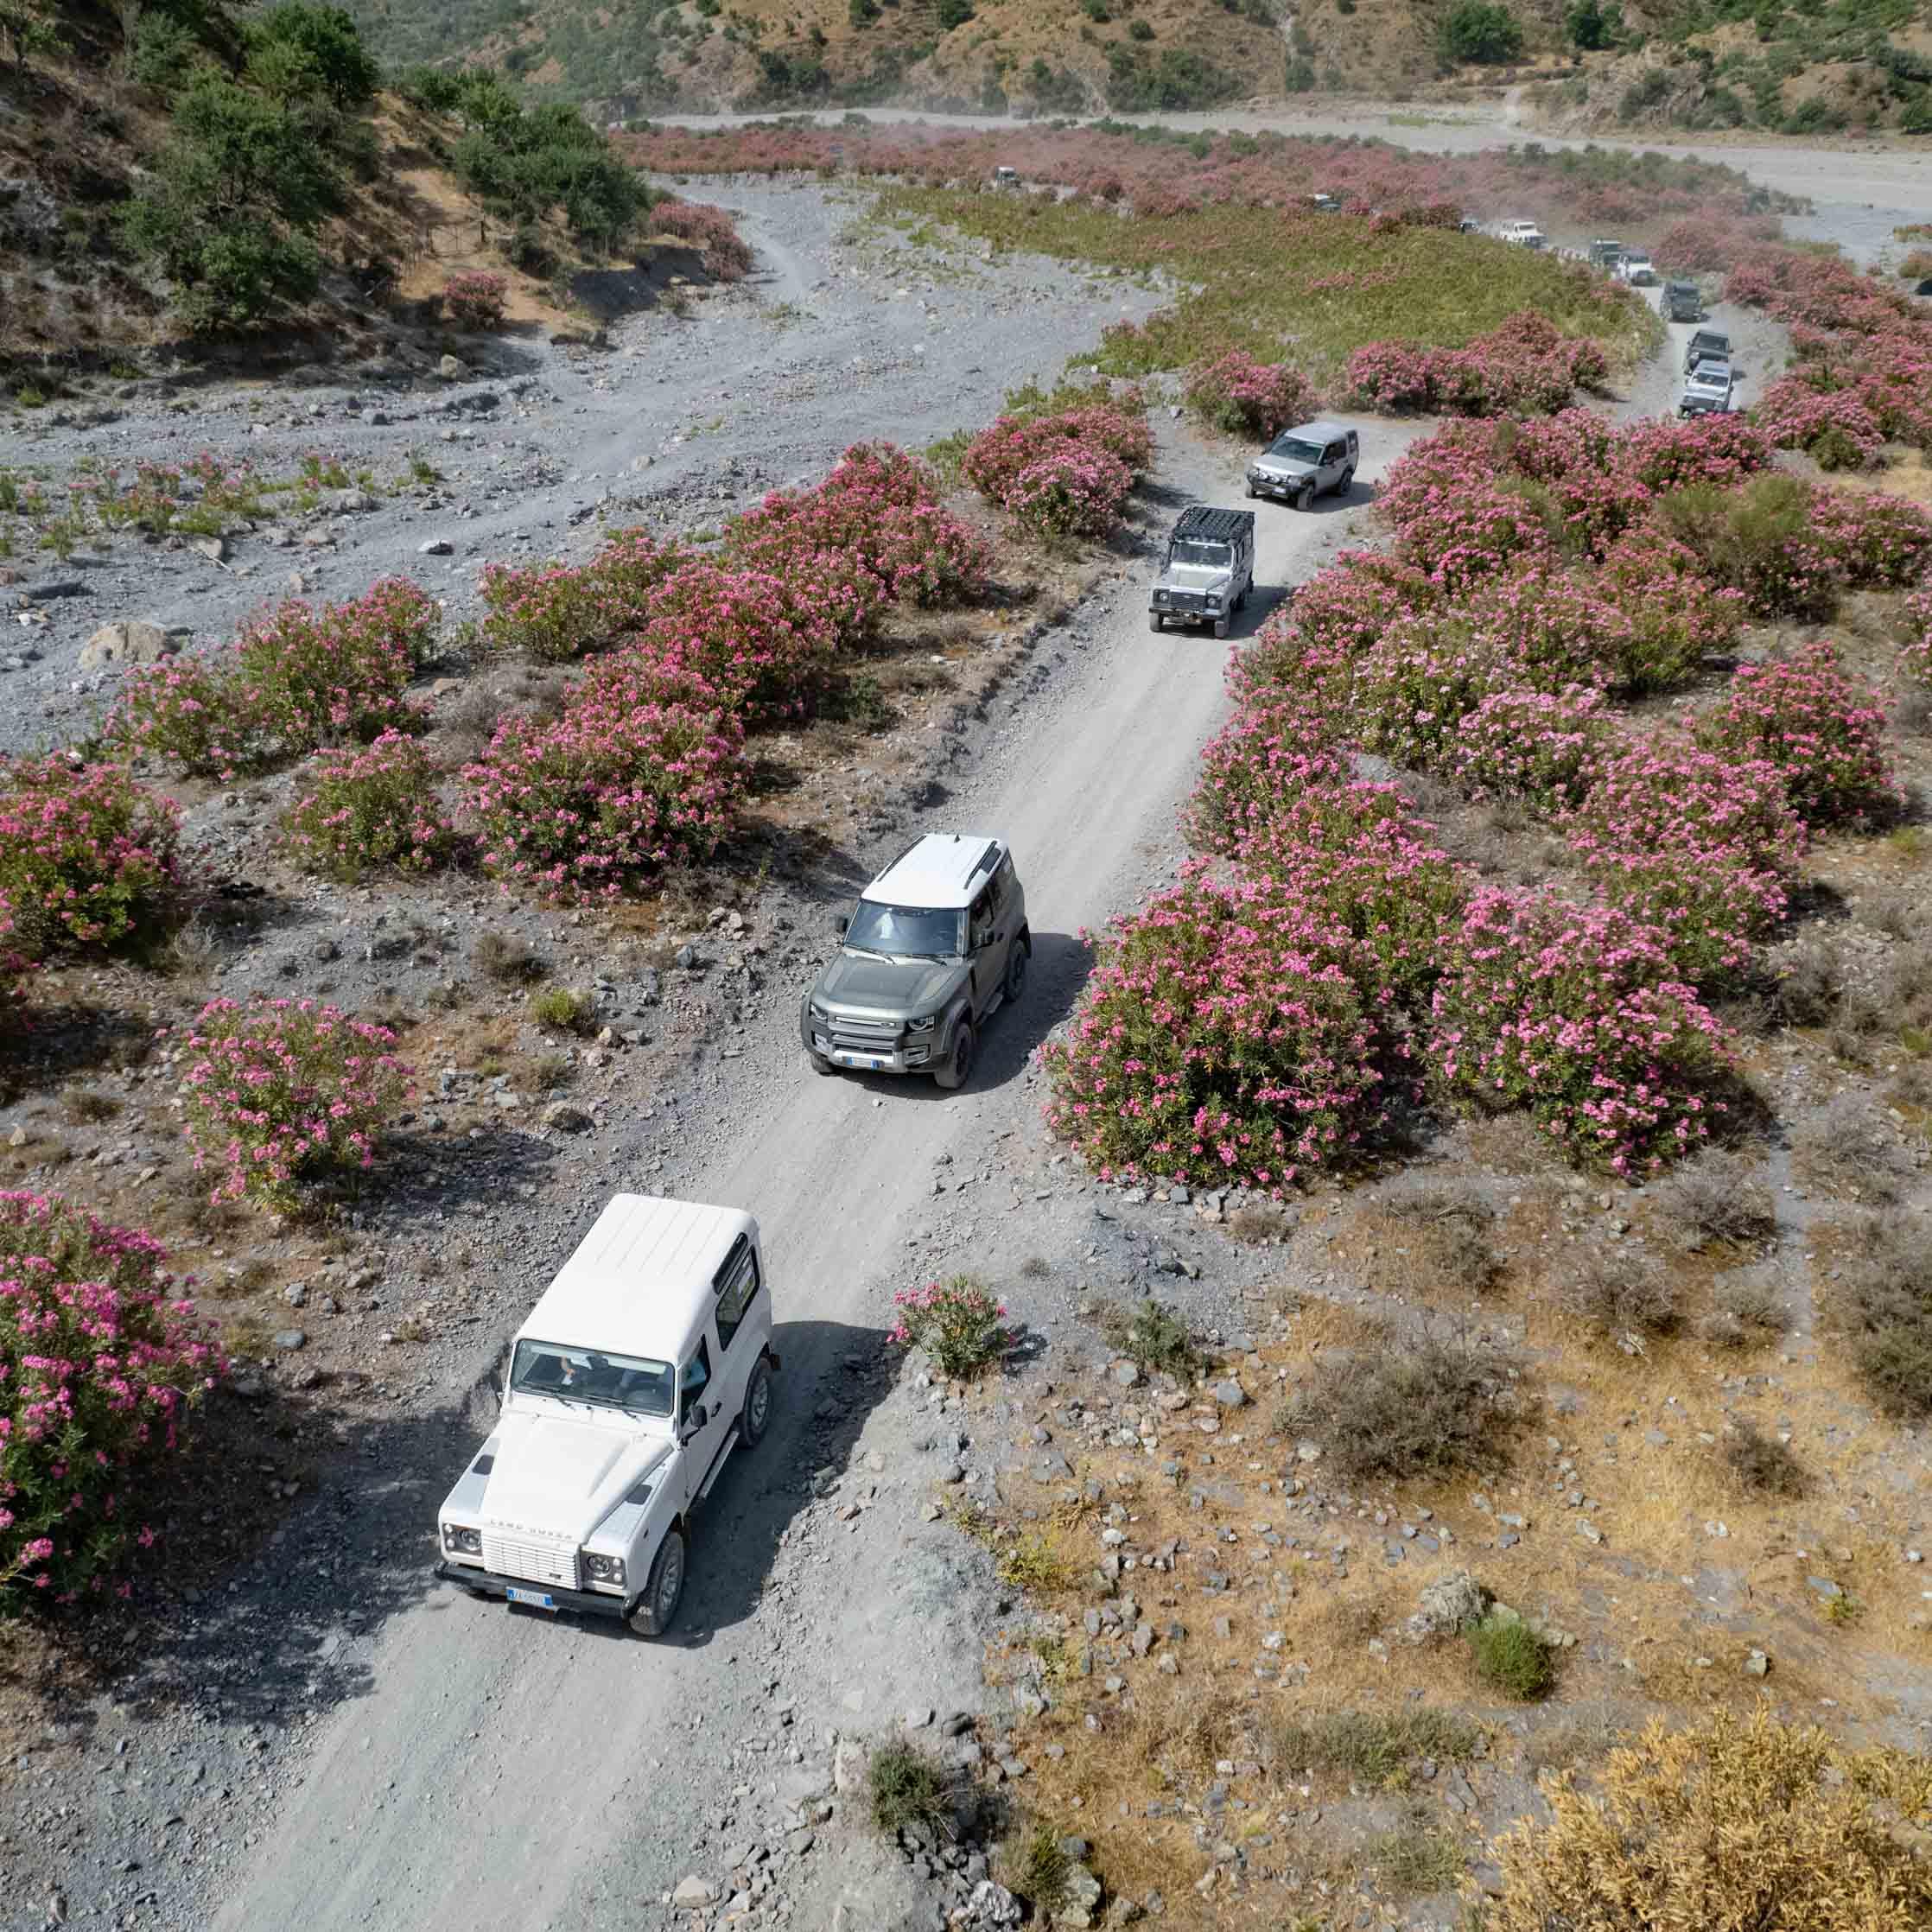 Land_Rover_Tour_Sicilia_2021_Land_Rover_Experience_Italia_-8